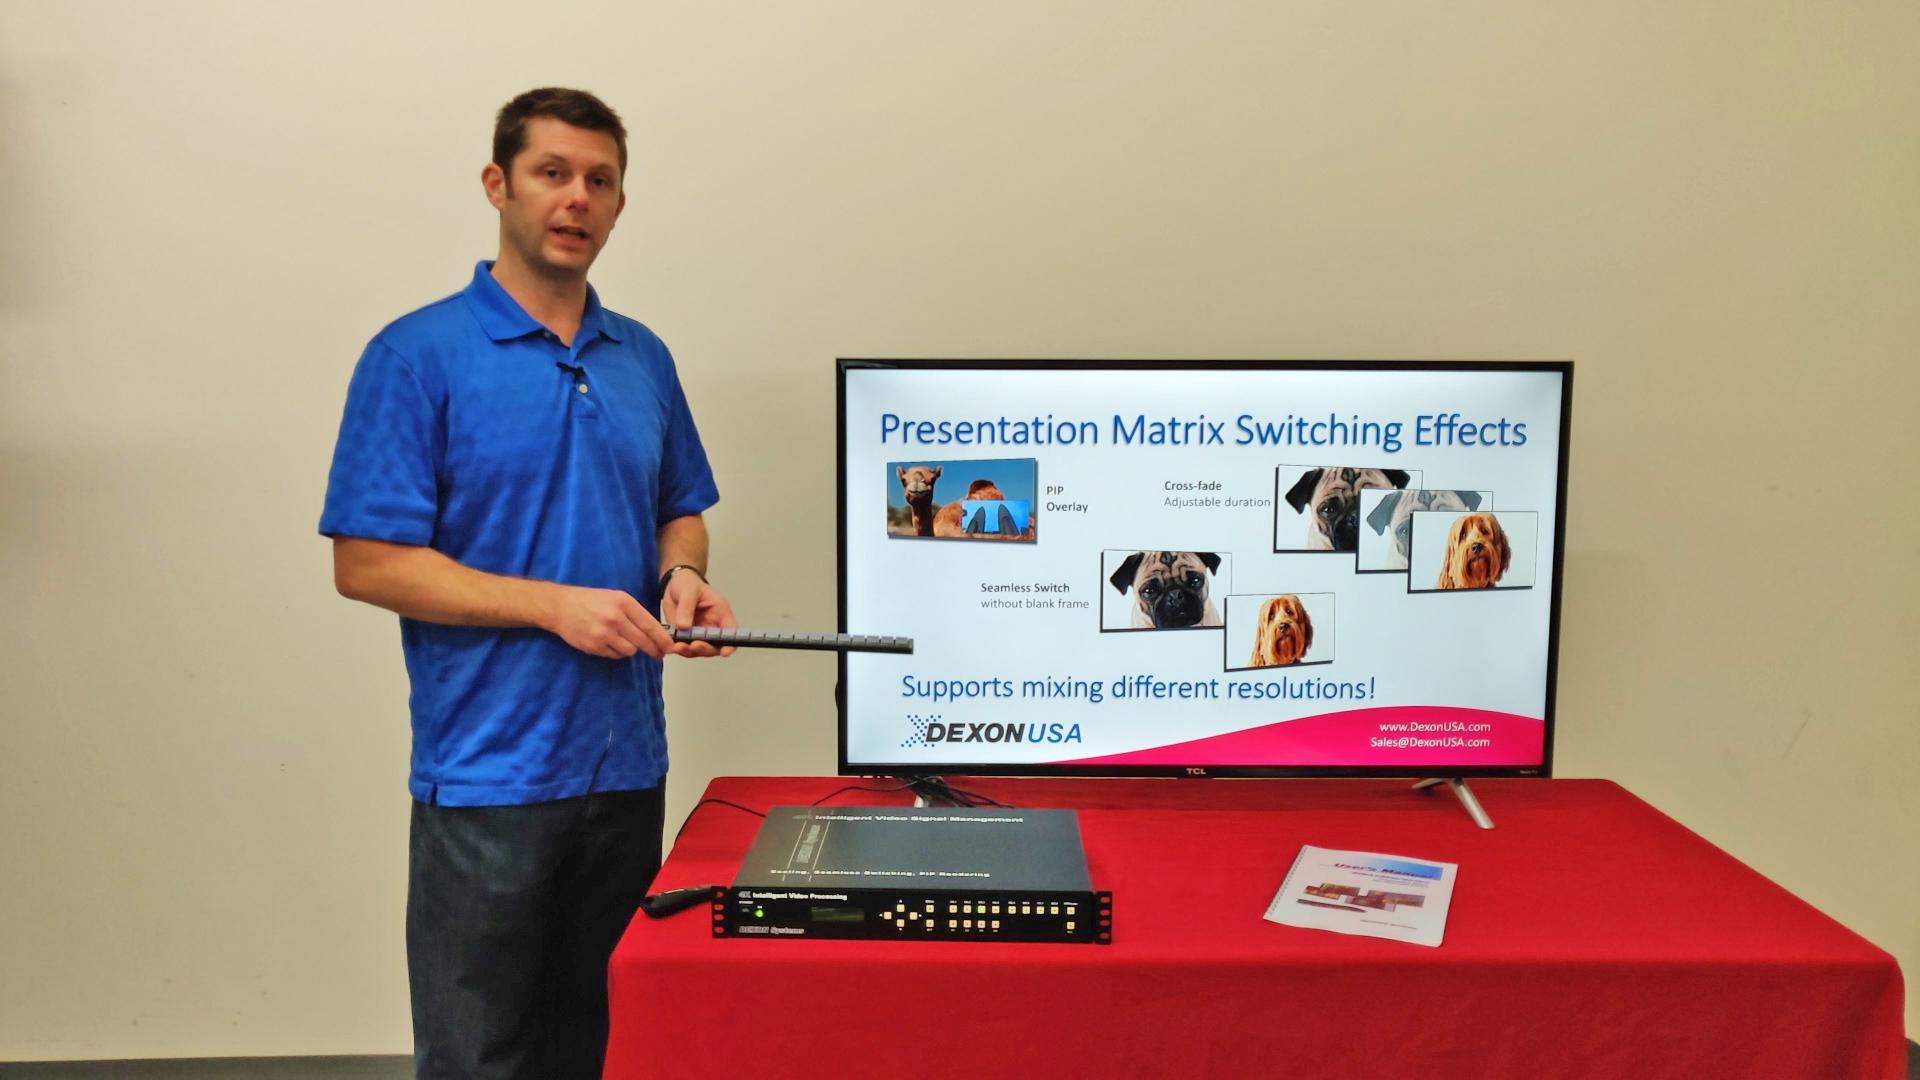 Presentation Matrix Image